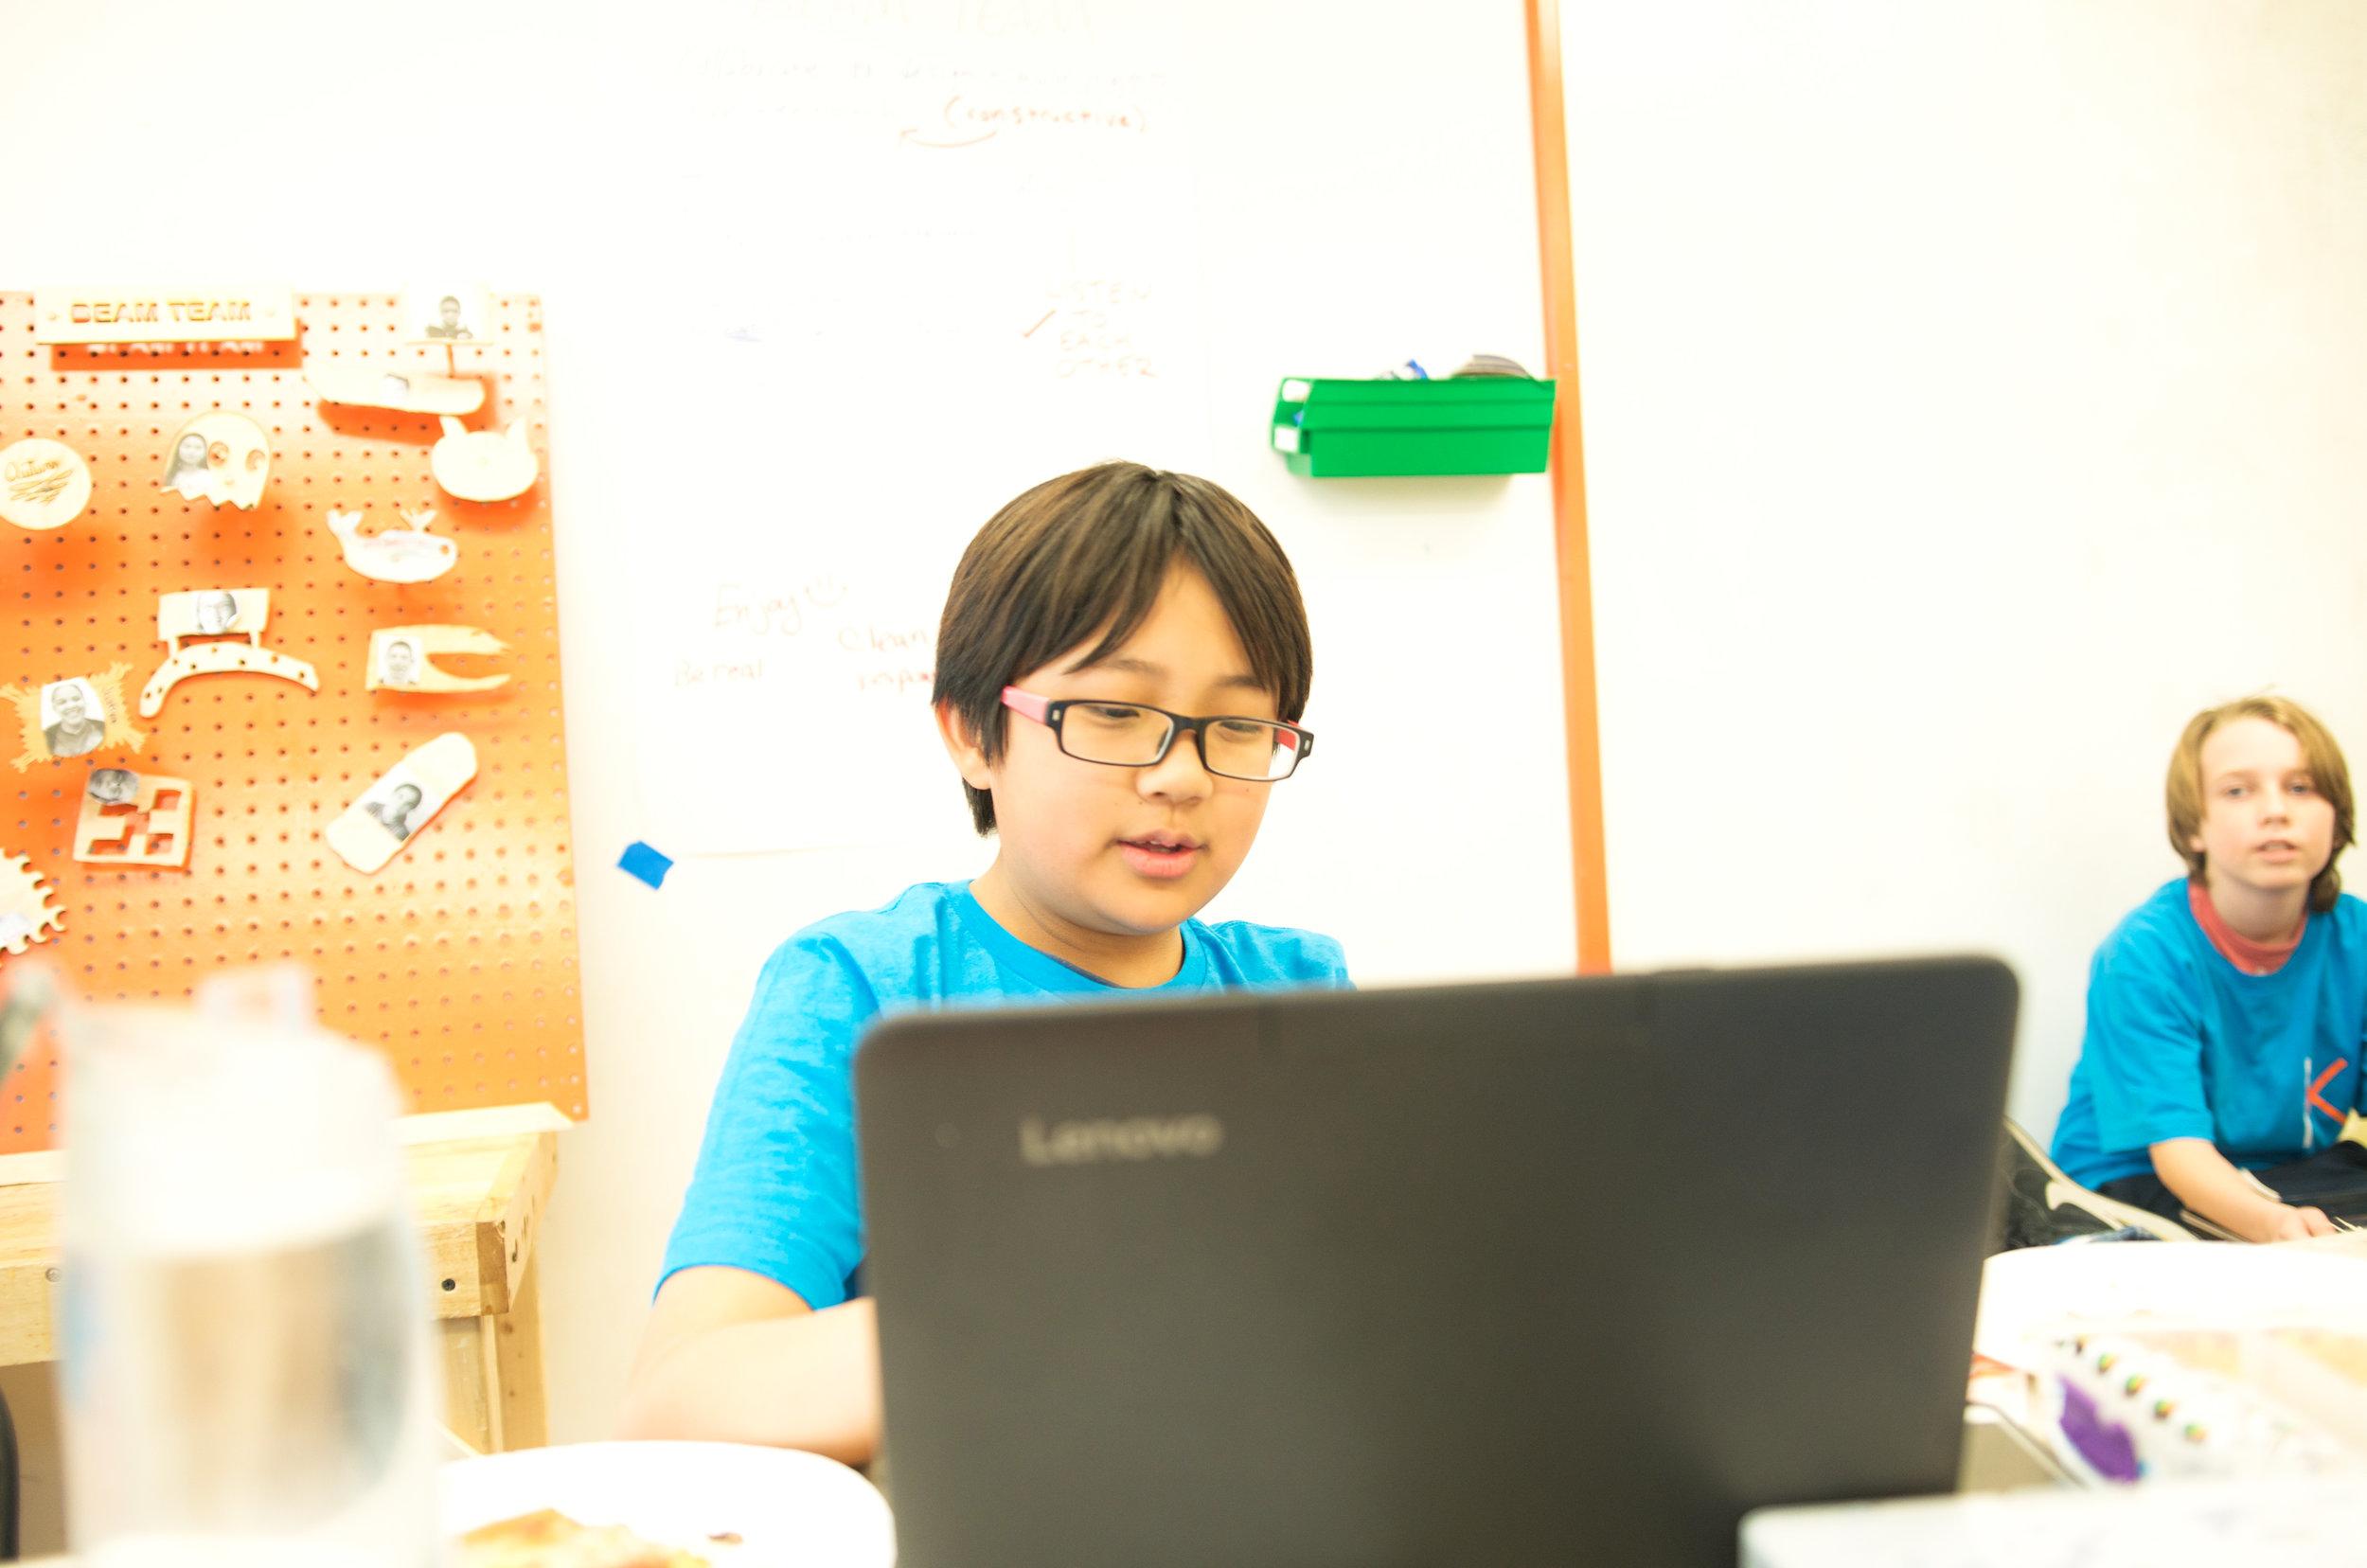 Student Coding Website on Laptop